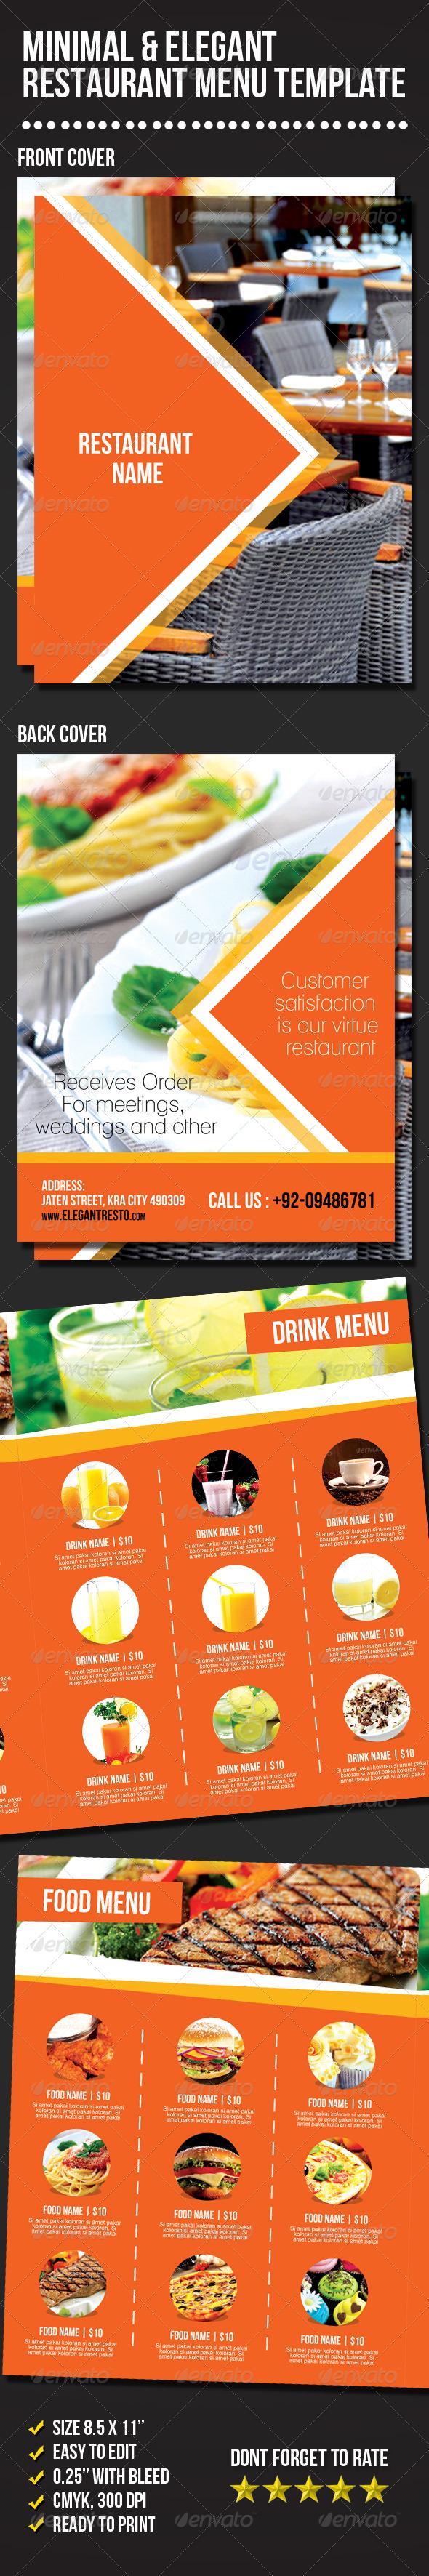 Minimal & Elegant Restaurant Menu Template - Food Menus Print Templates